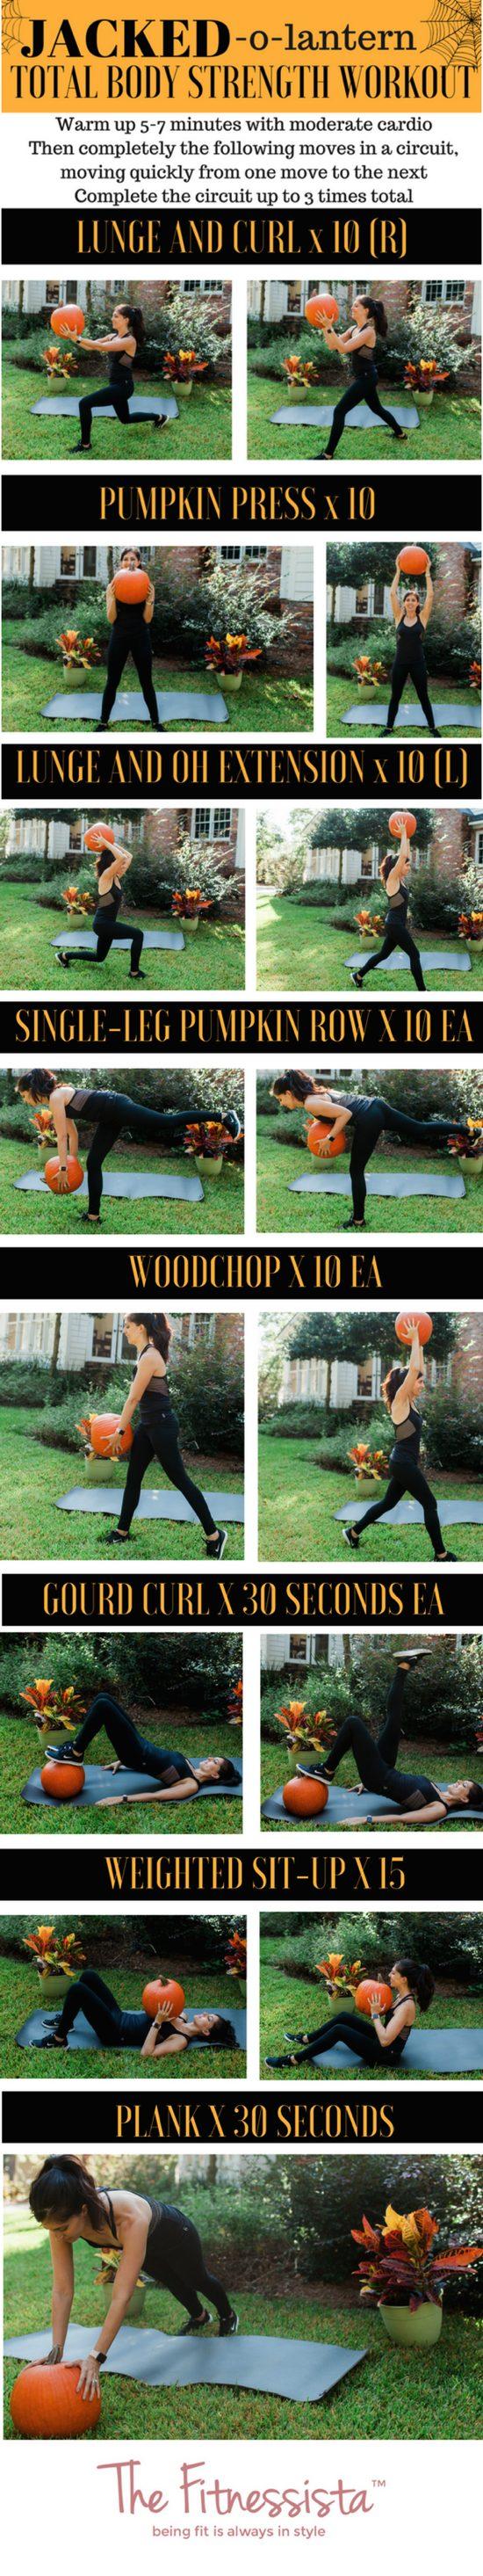 Jacked o lantern total body strength workout using a pumpkin